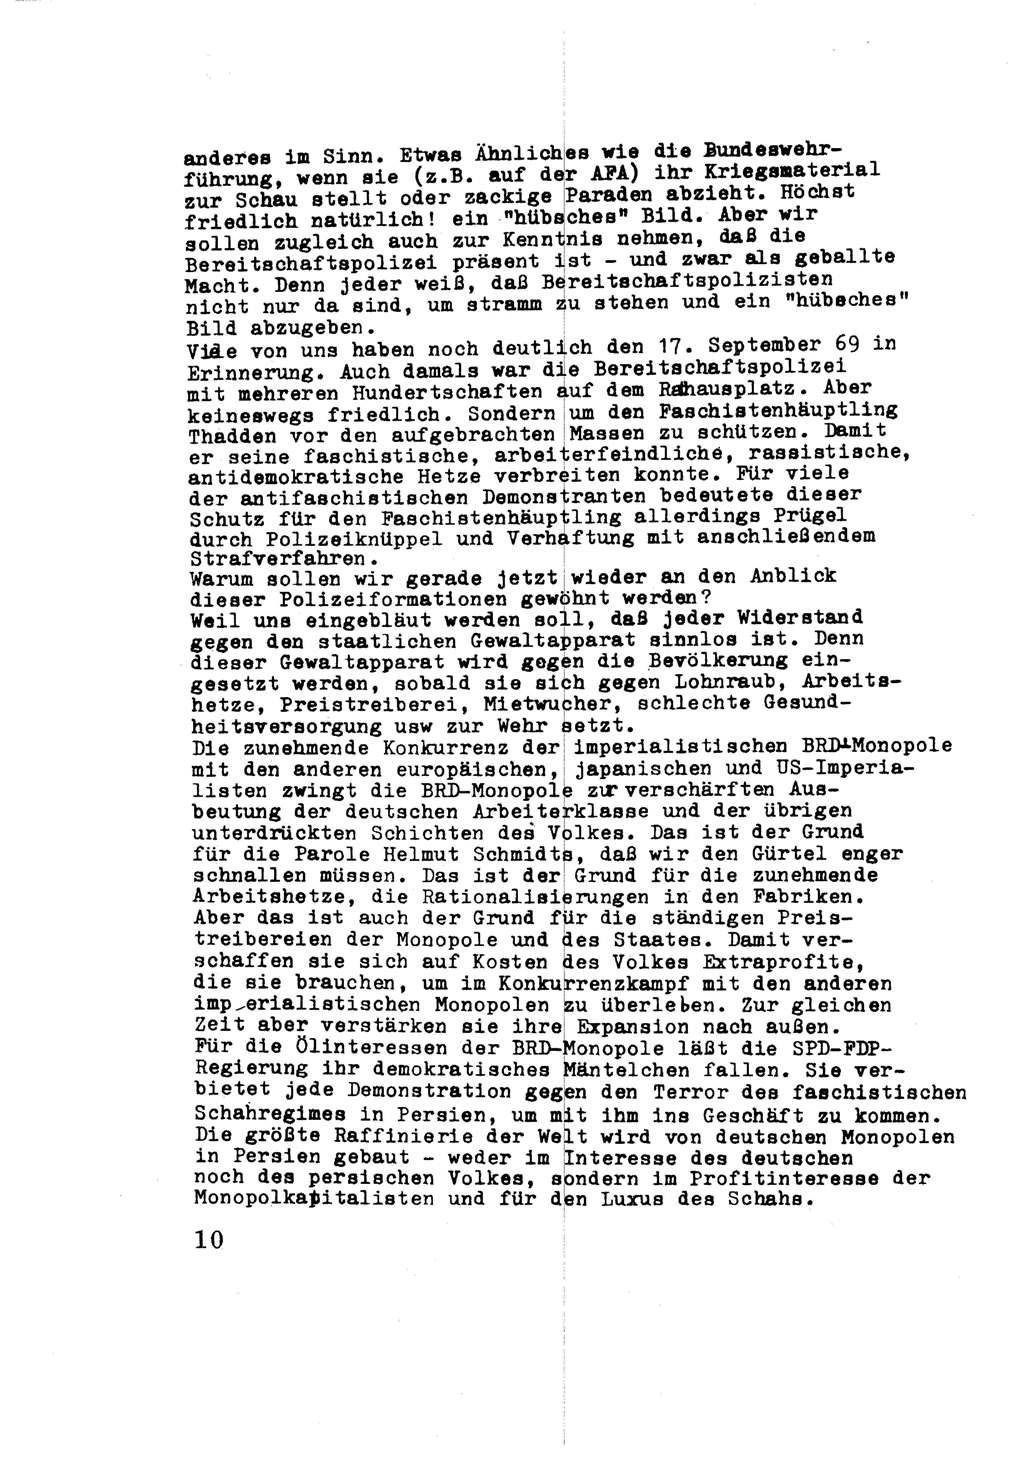 RHeV_Anschuldigung_RA_Gildemeier_Seite_10